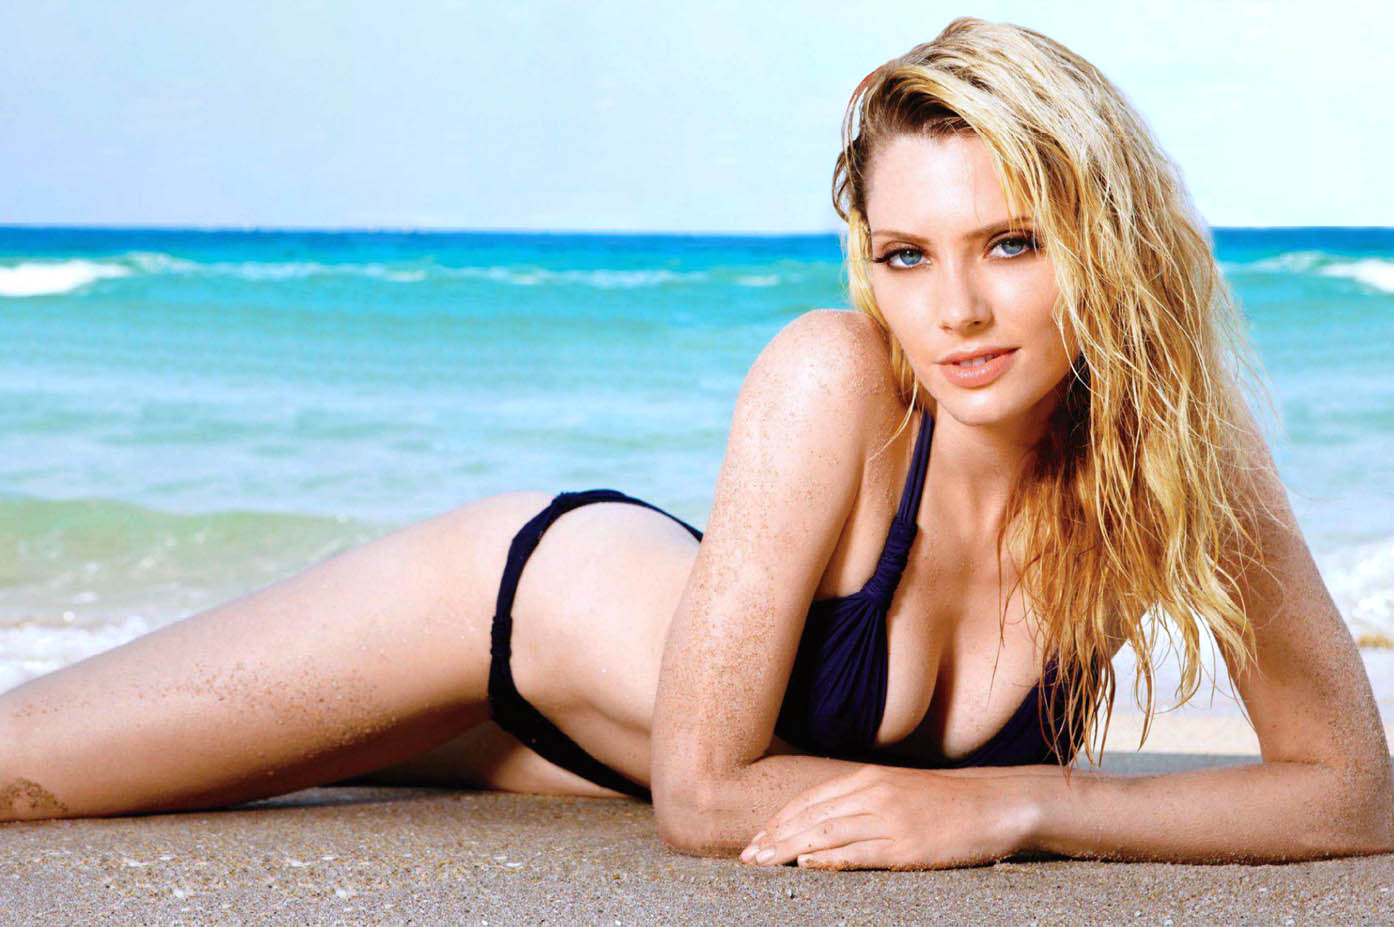 April Bowlby in a bikini